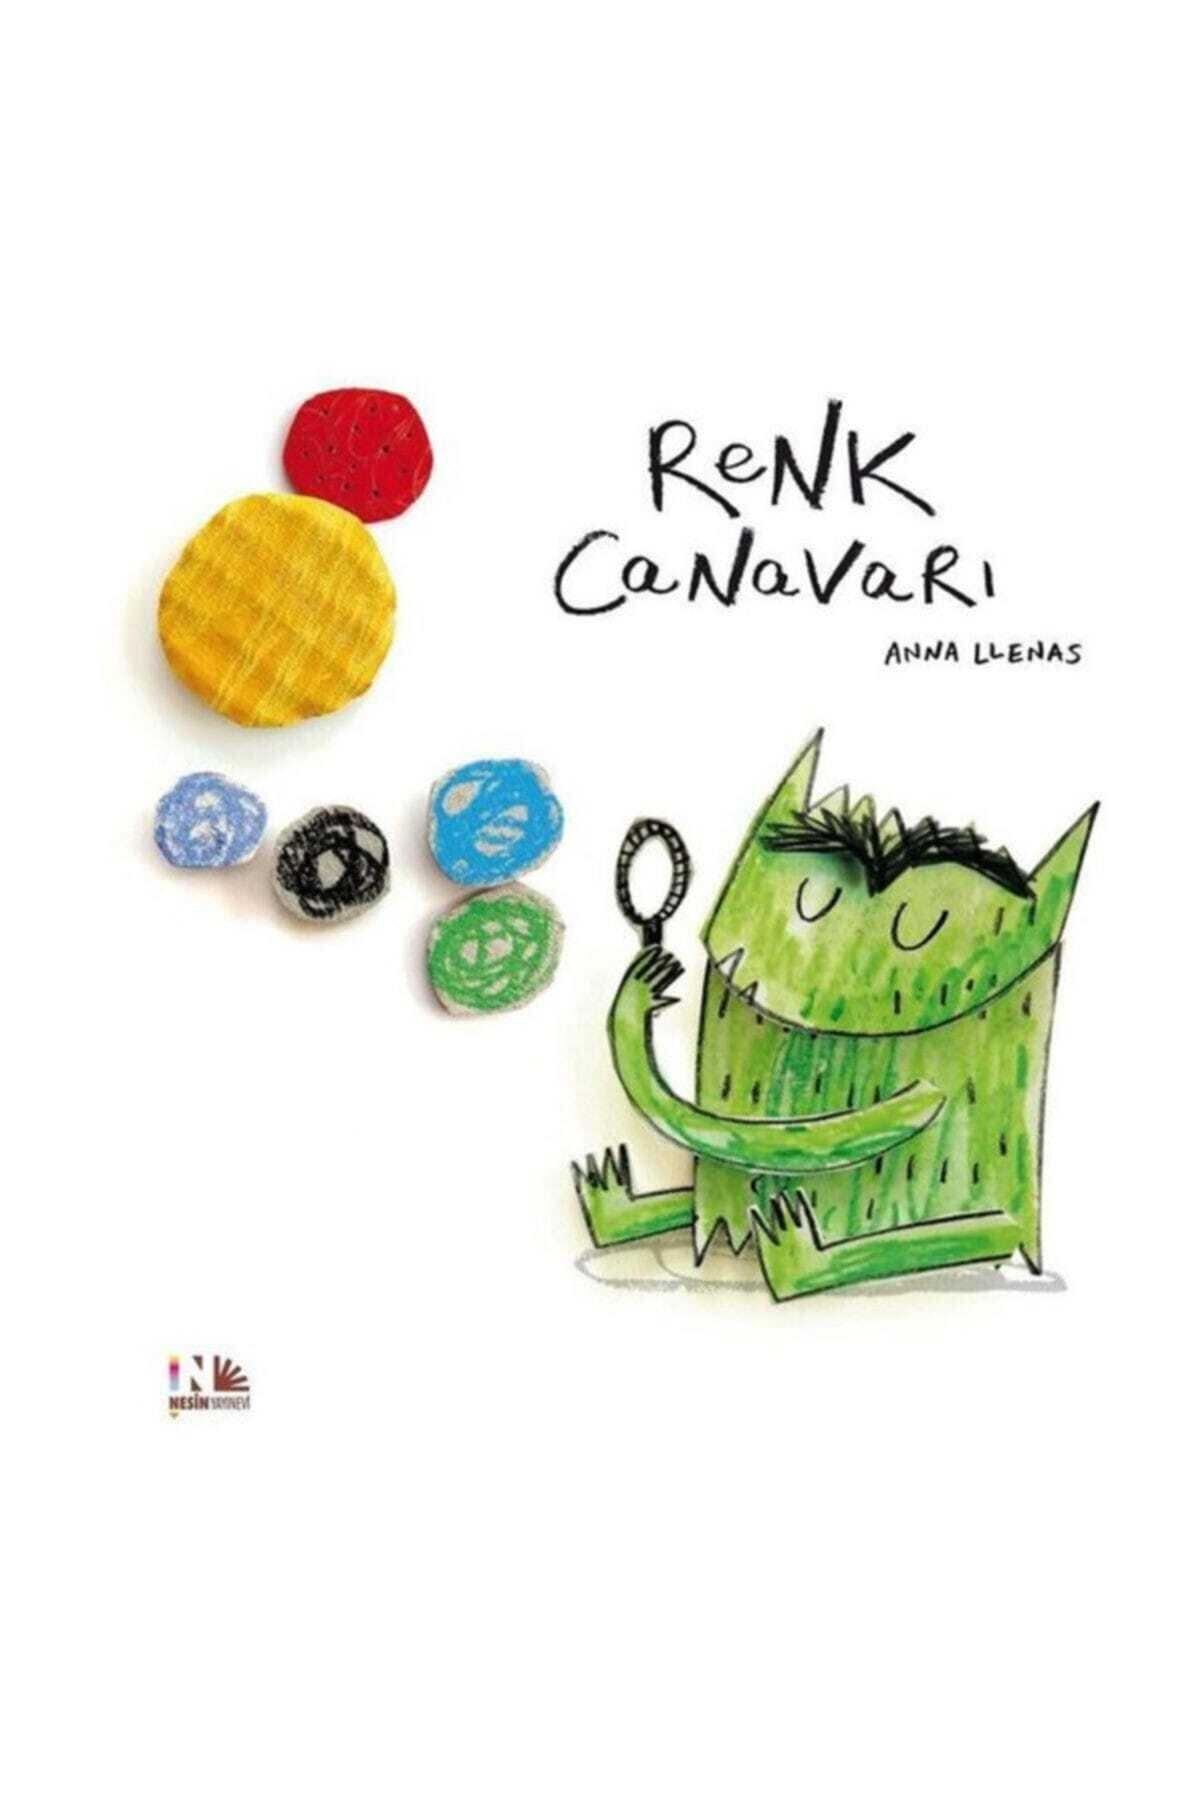 Nesin Yayınları Renk Canavarı - Anna Llenas 1